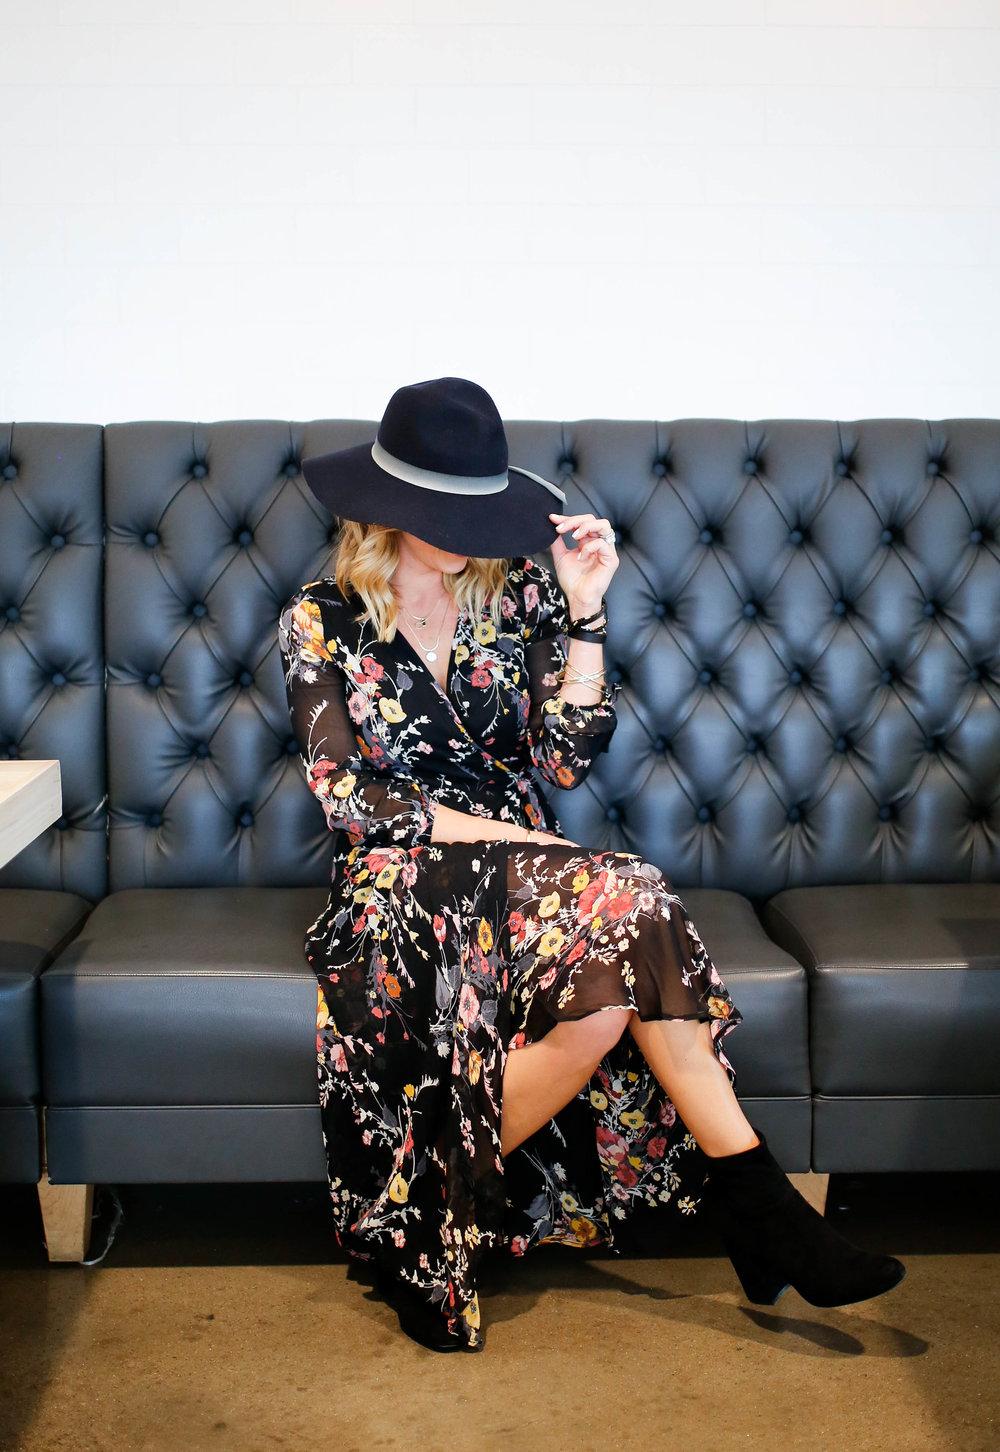 landyn sitting in dress.jpg